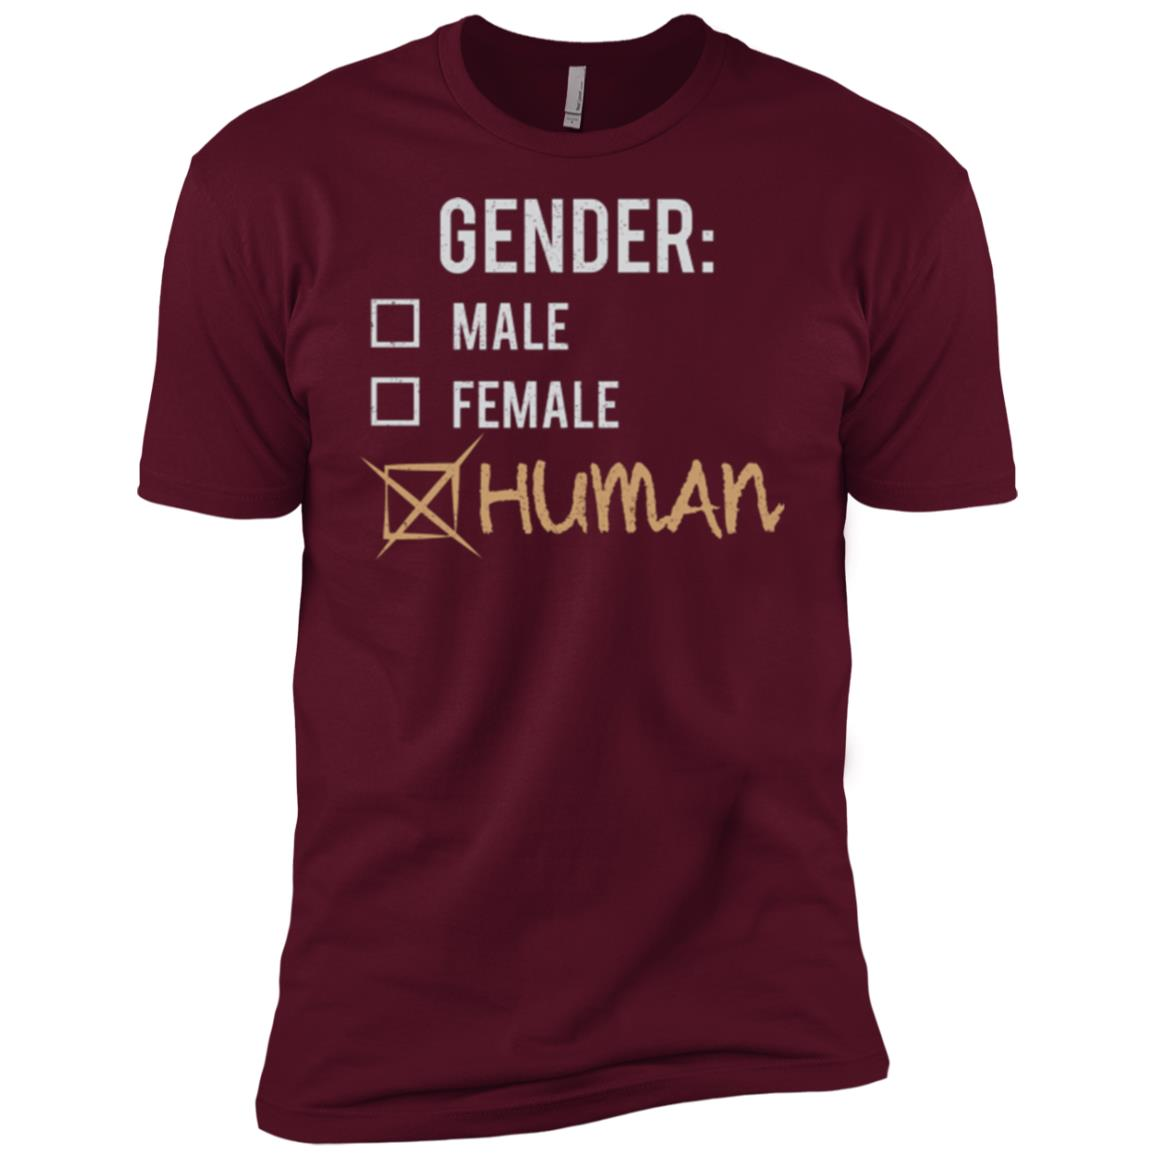 Male Female Human Gender Nonbinary Trans Men Short Sleeve T-Shirt